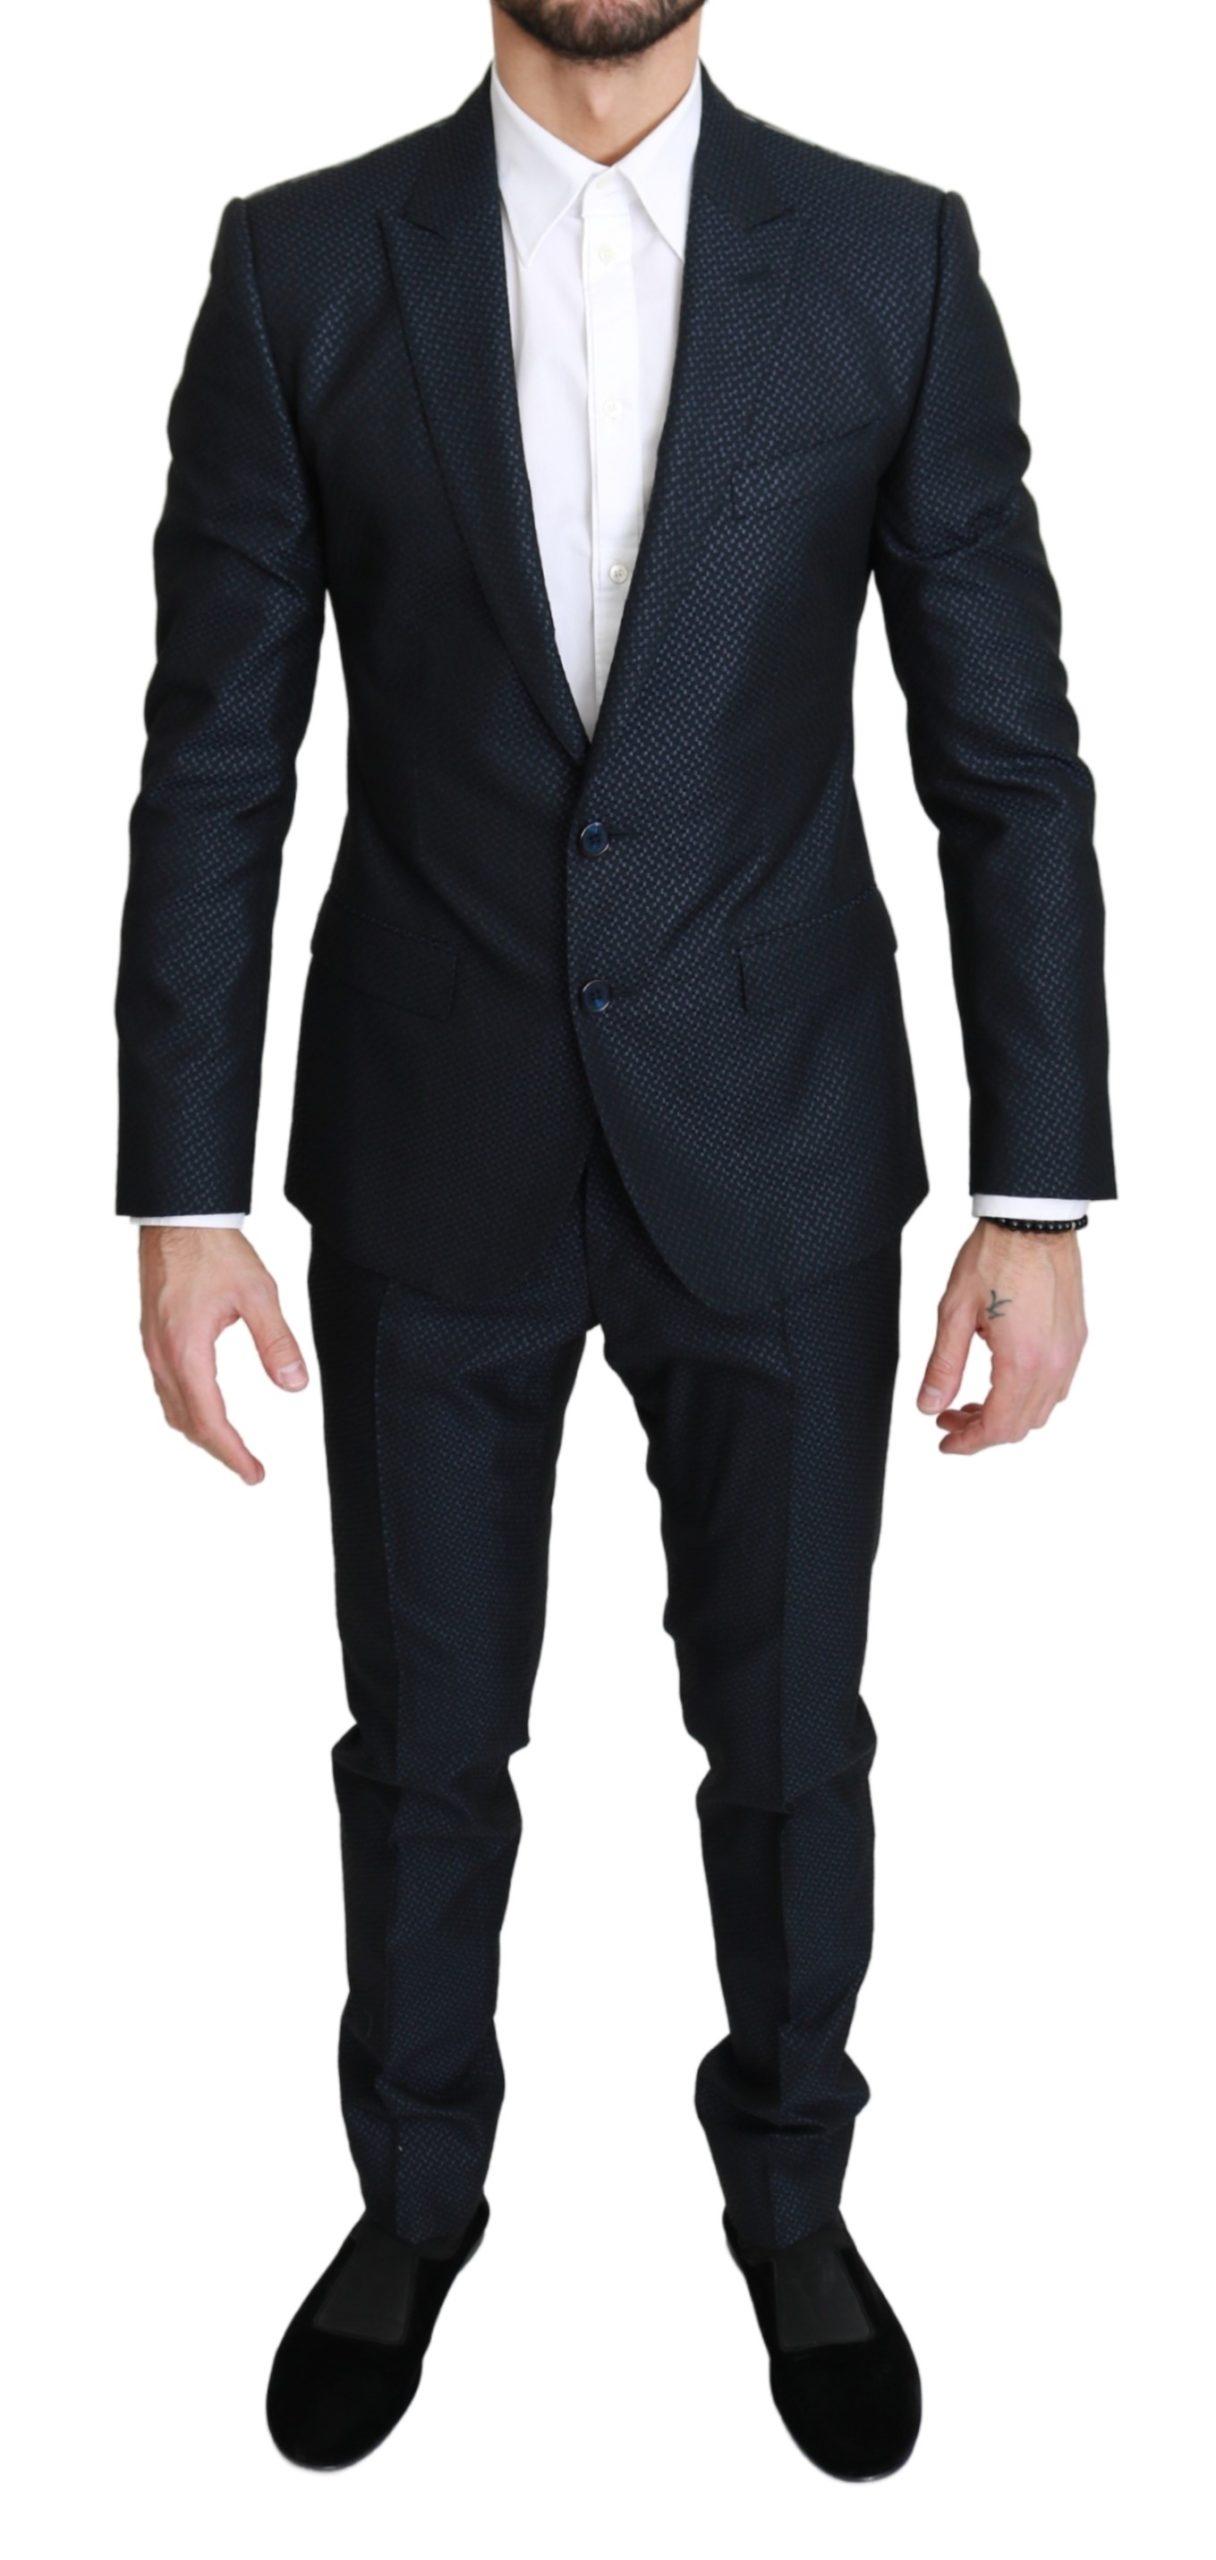 Dolce & Gabbana Men's Single Breasted 2 Piece MARTINI Suit Blue KOS1747 - IT46 | S